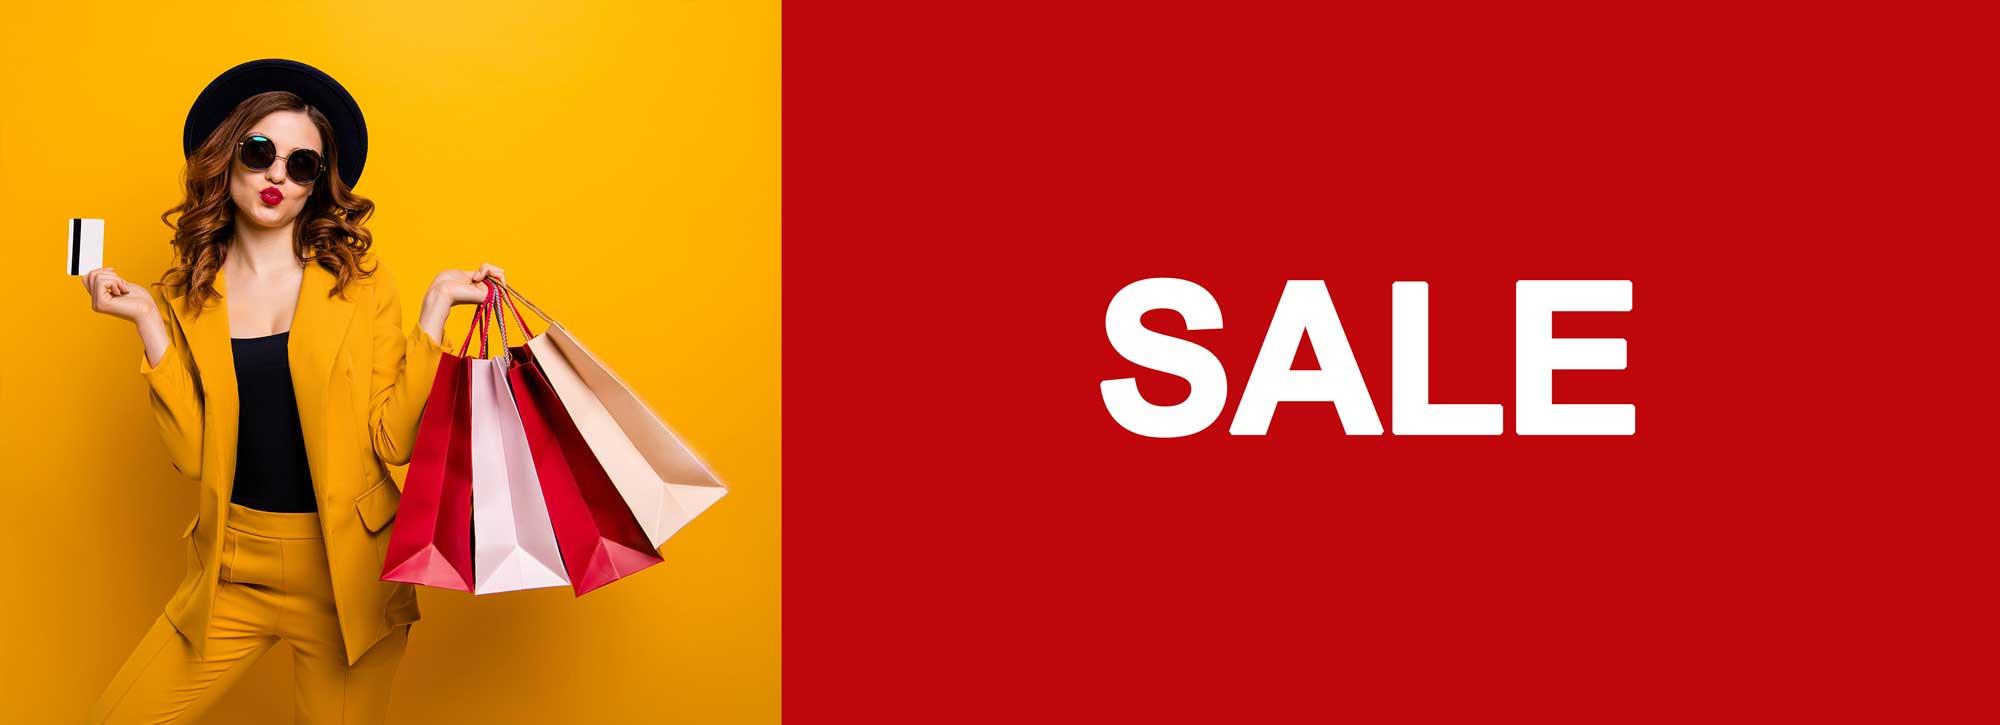 Banner Sale Aktuelle Angebote